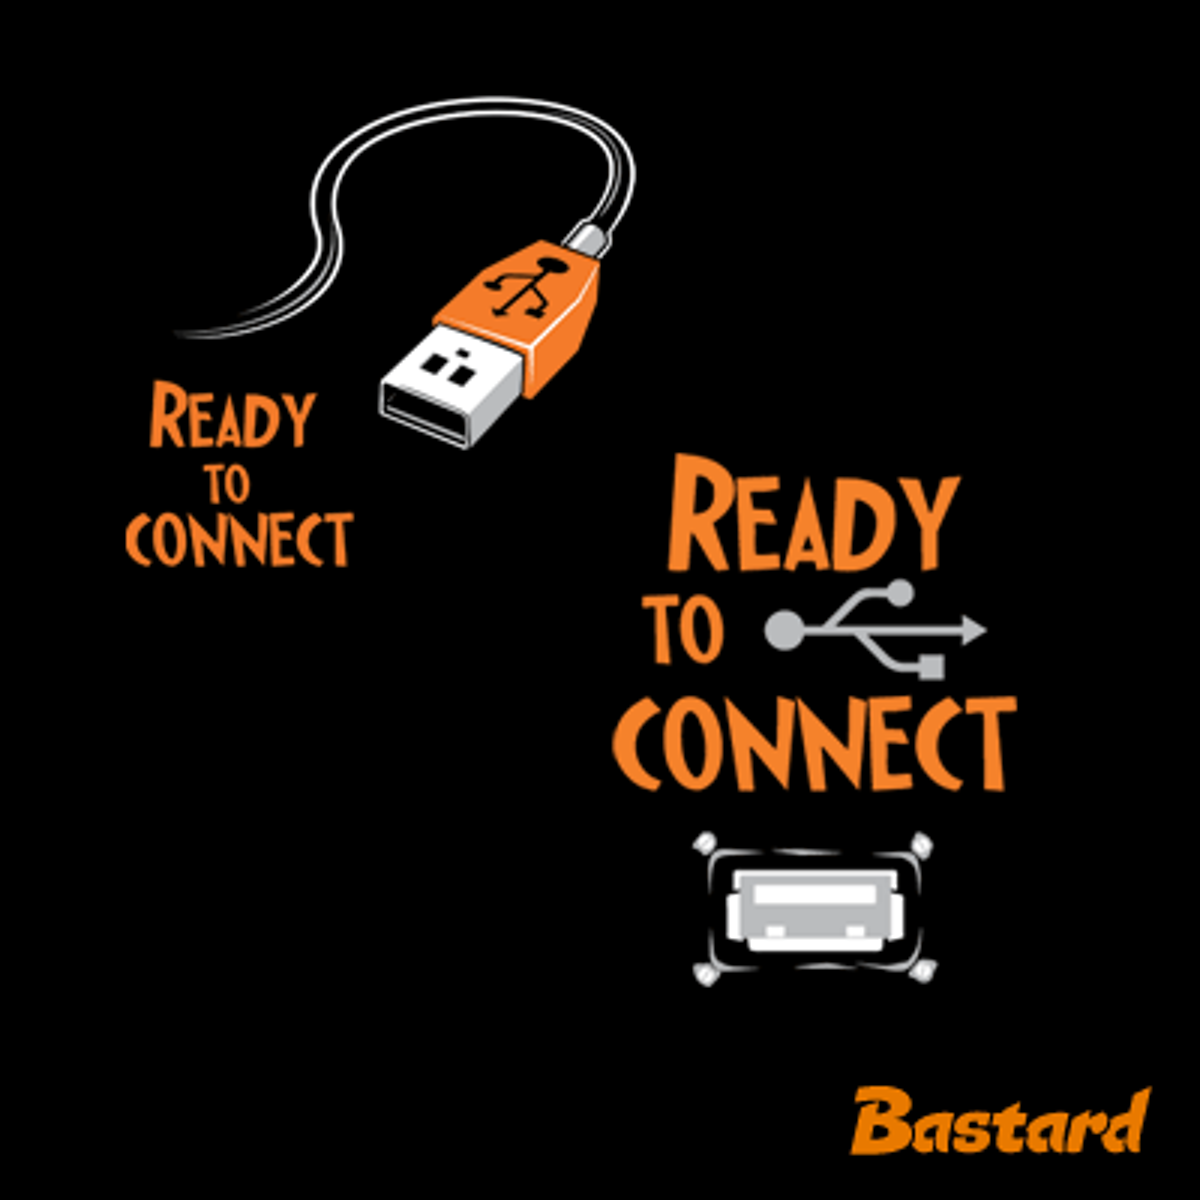 USB pripojenie